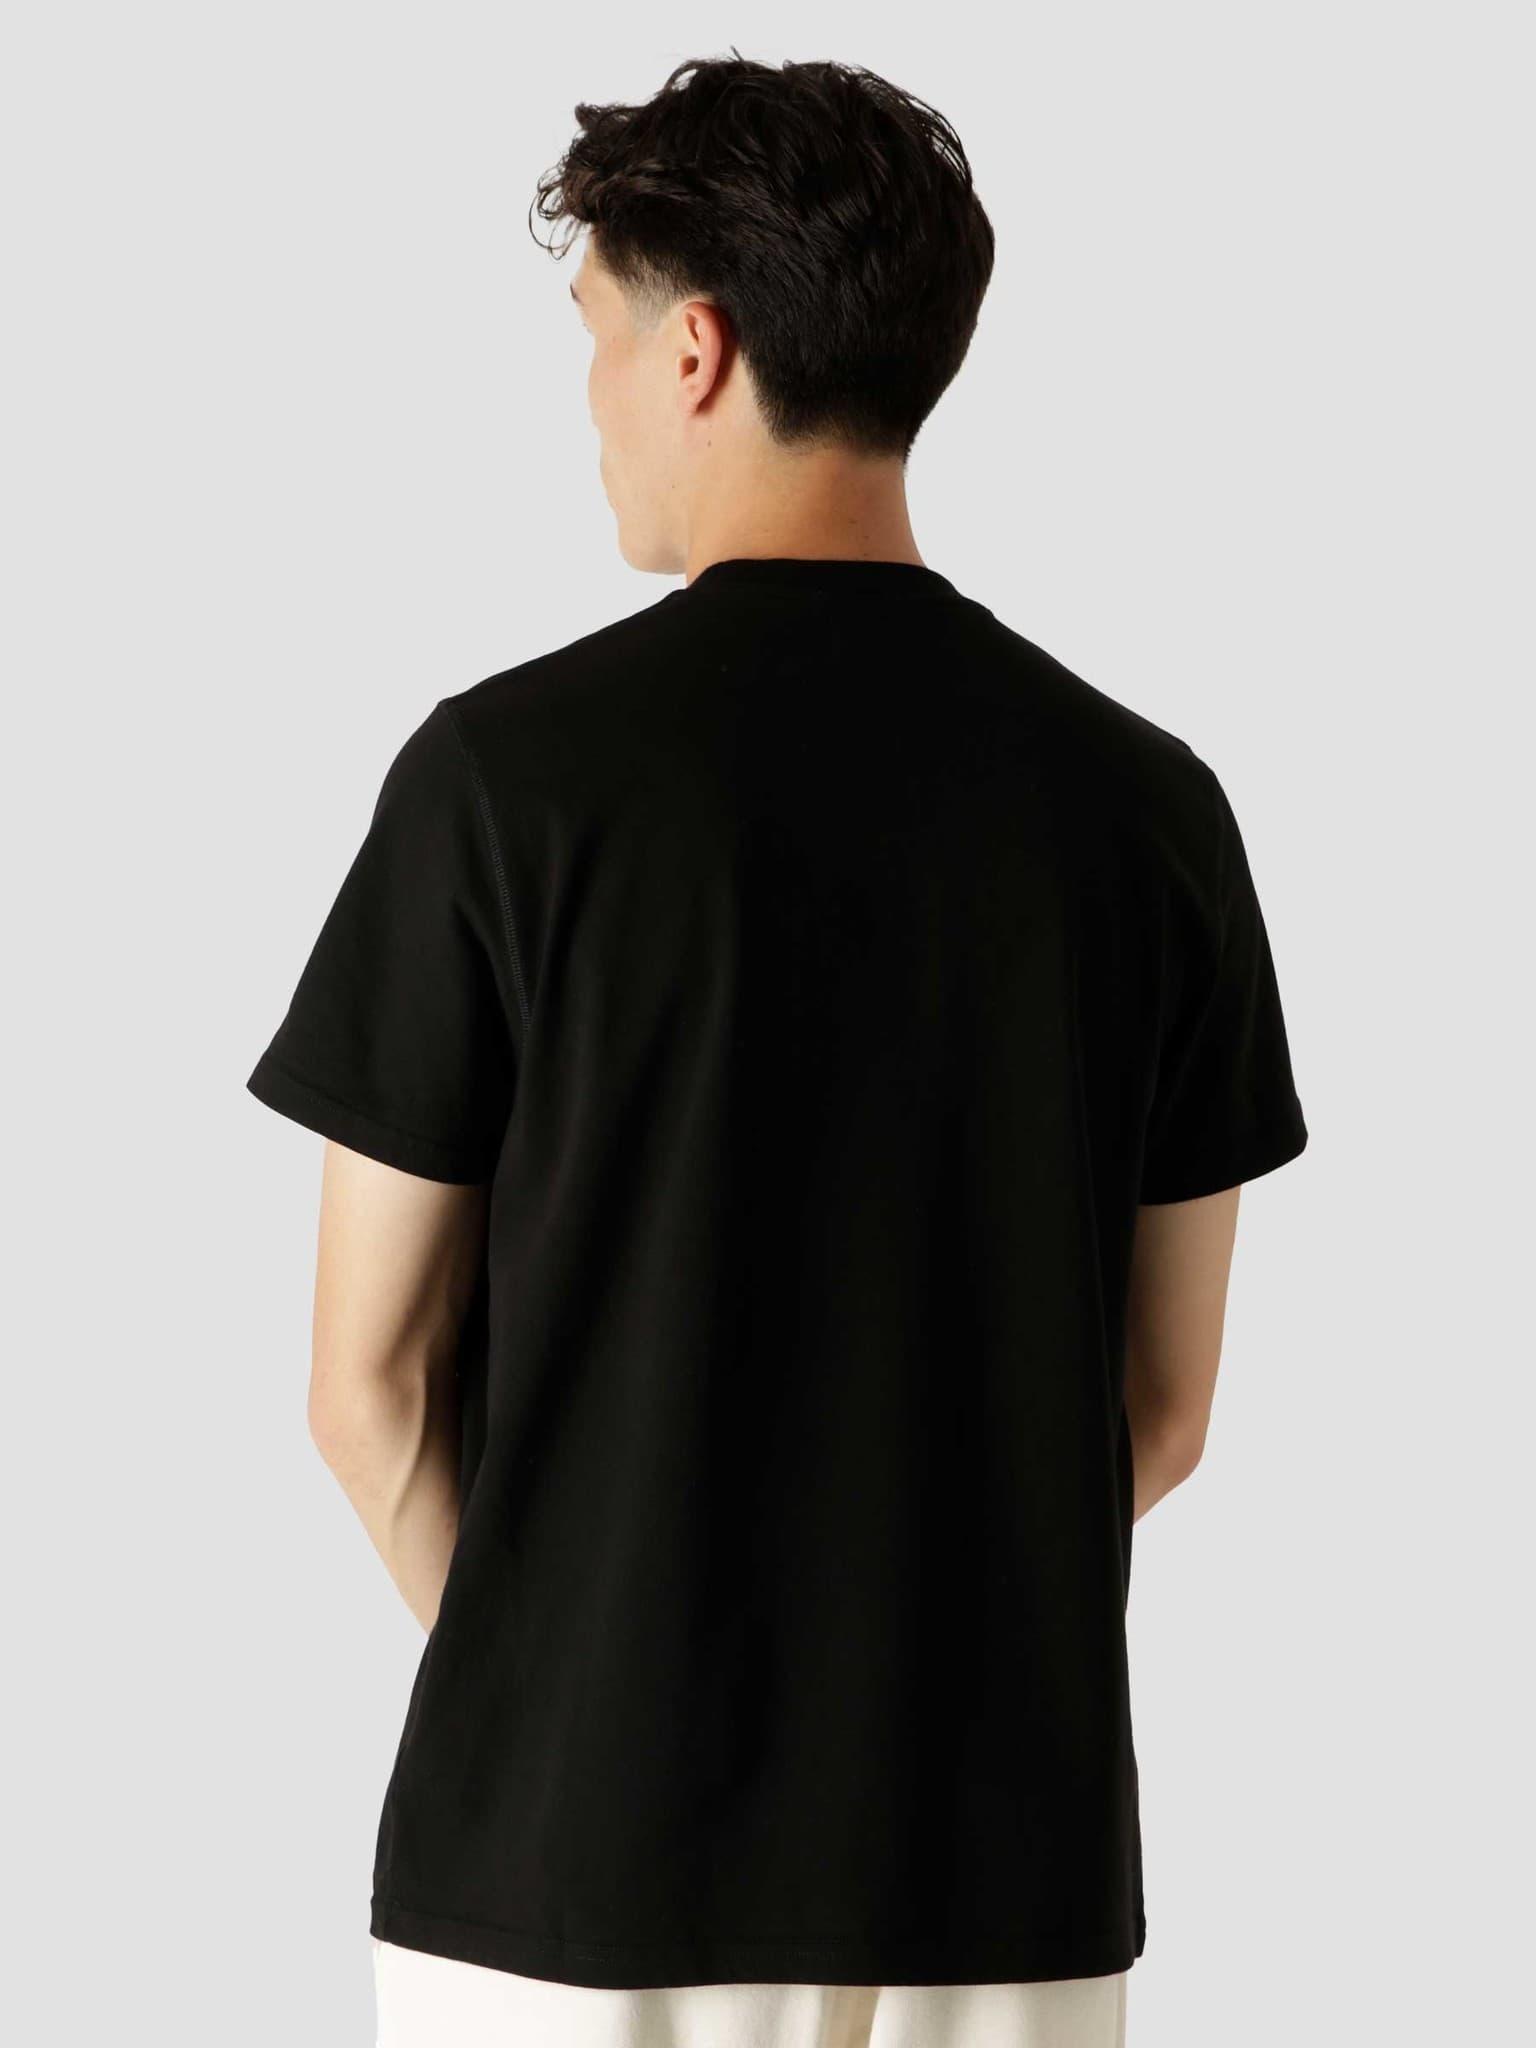 Tissot Multi Logo T-Shirt Black AW21-072T